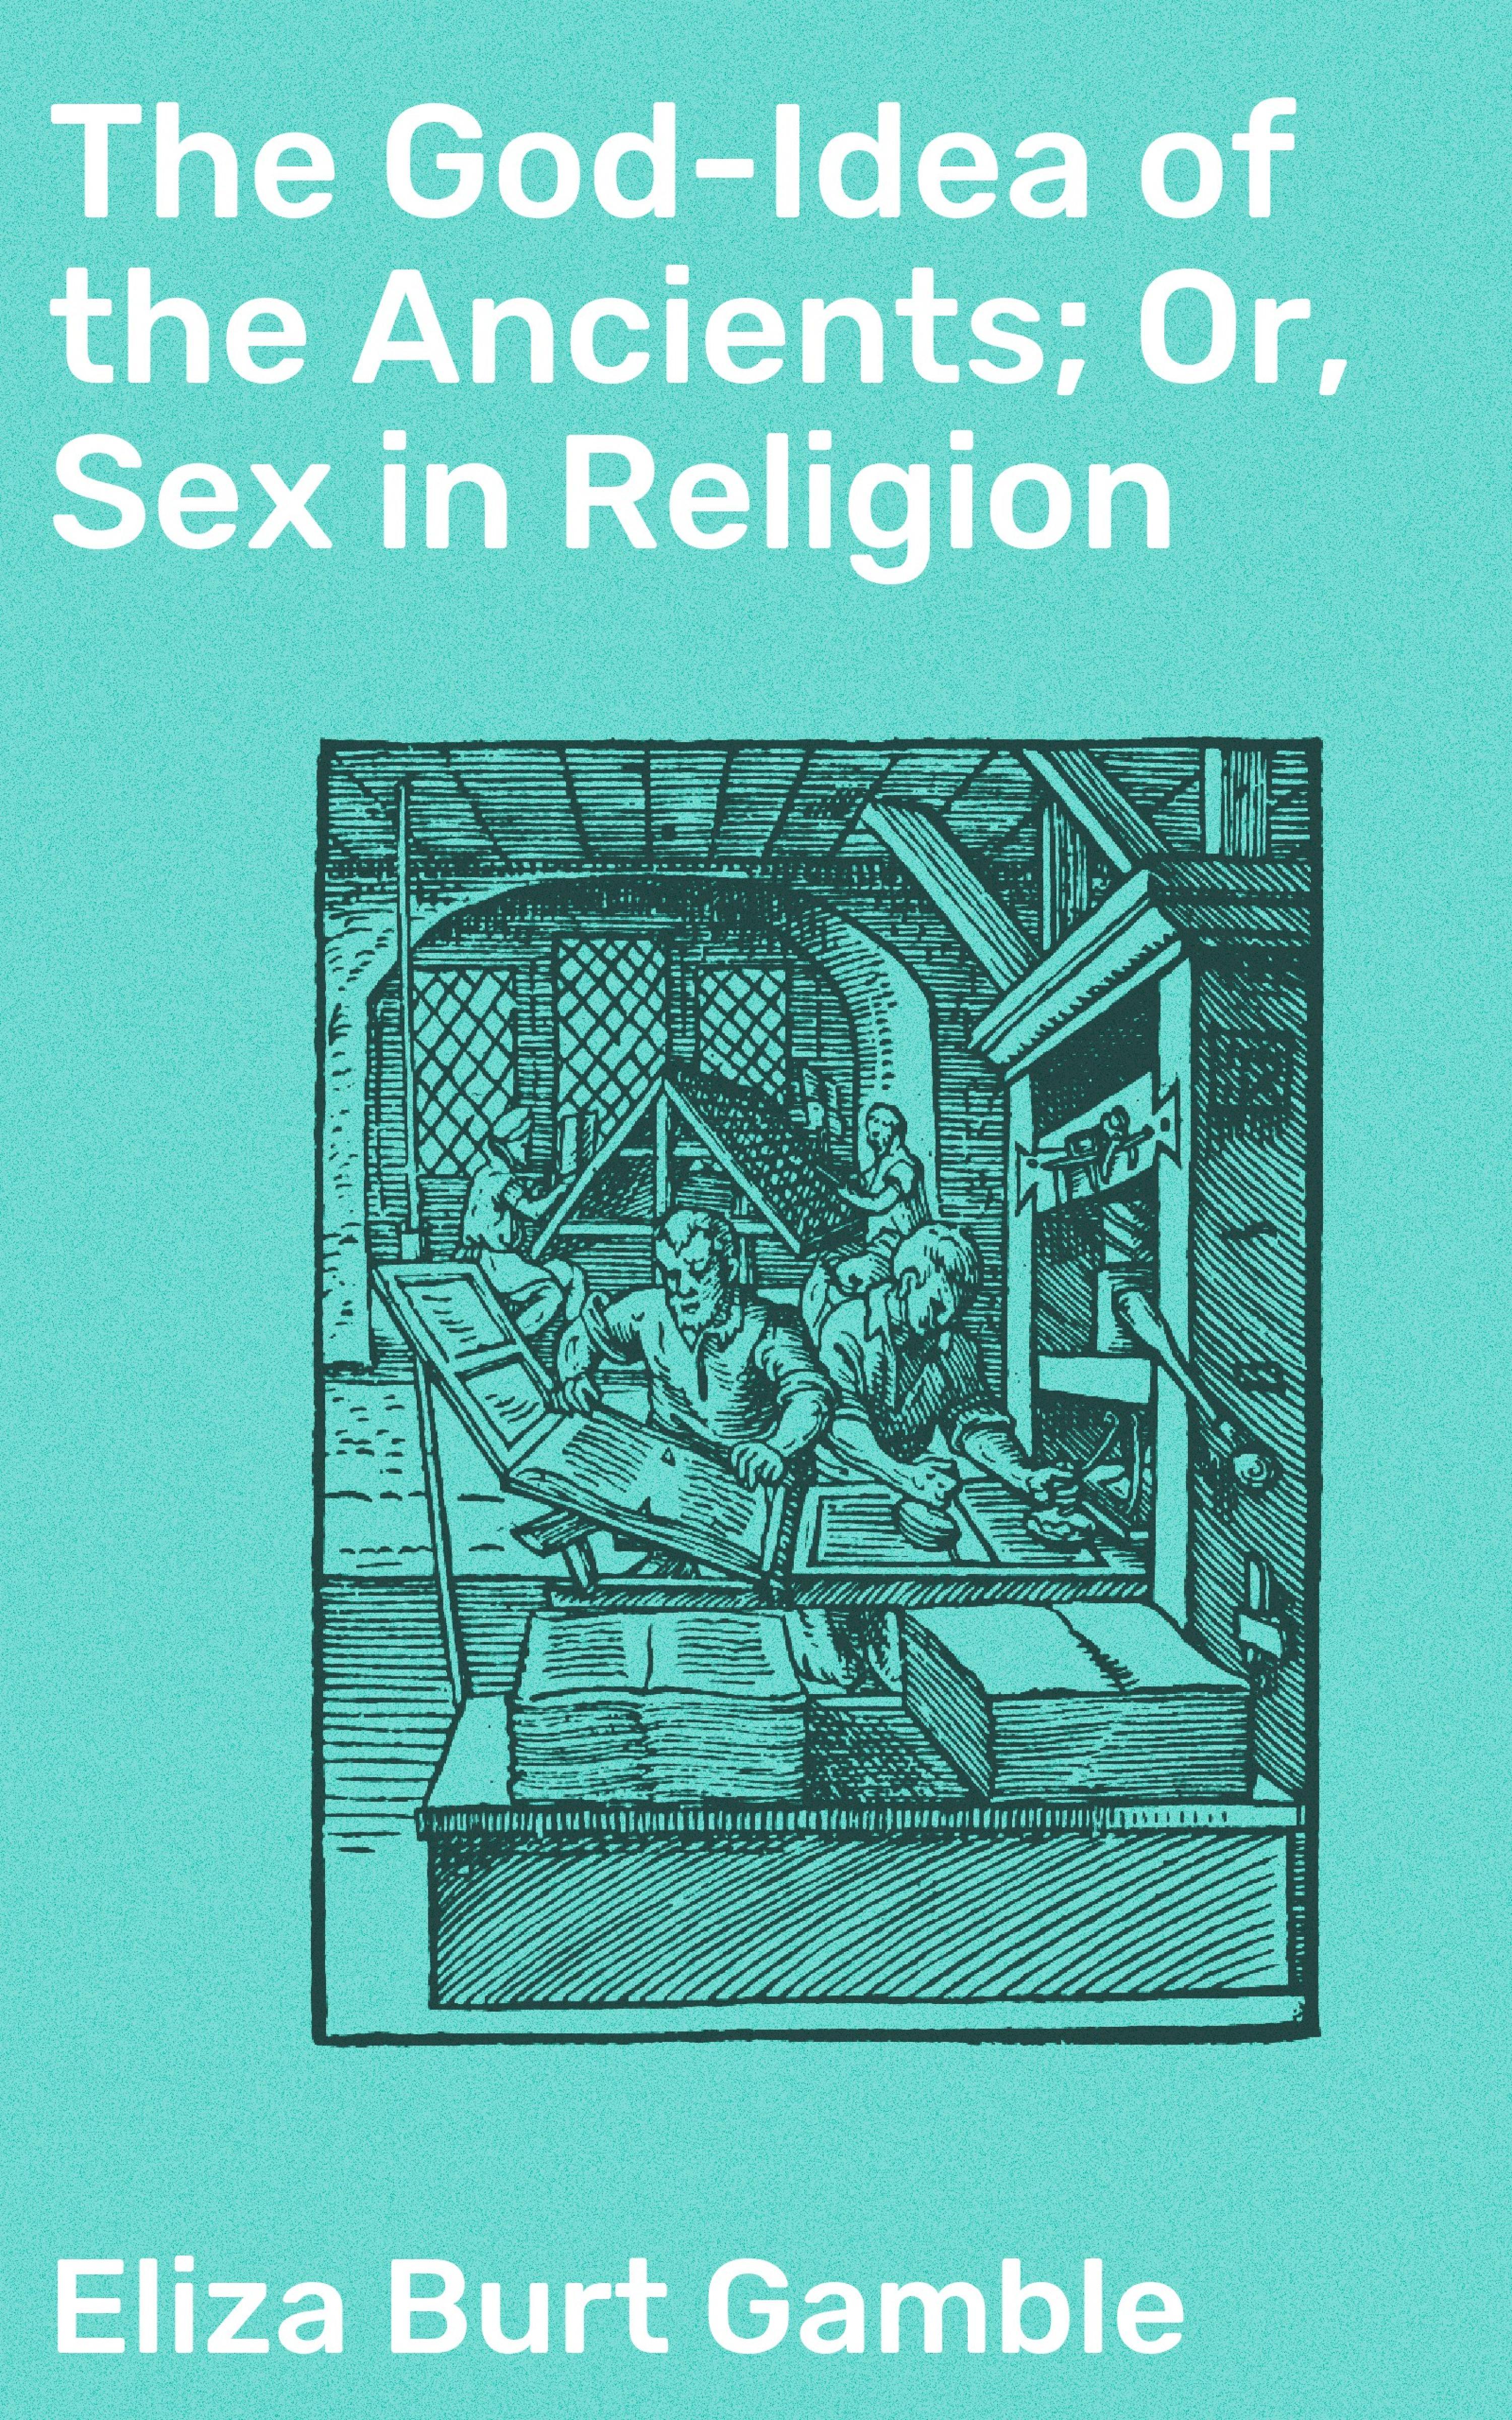 цена на Eliza Burt Gamble The God-Idea of the Ancients; Or, Sex in Religion